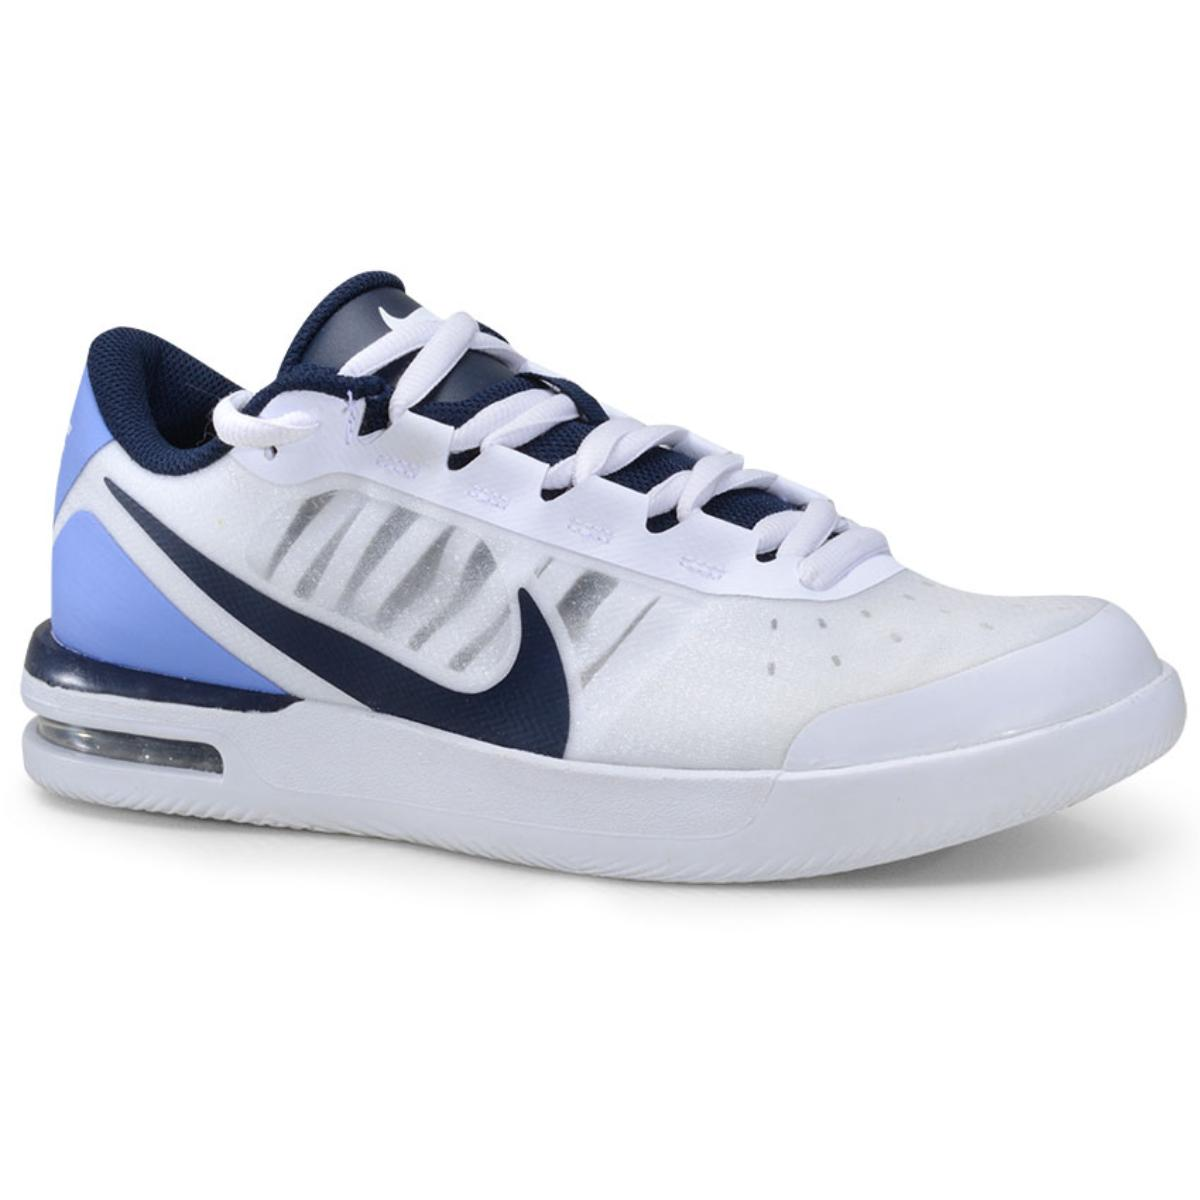 Tênis Masculino Nike Bq0129-106 Court Air Max Vapor Wing Branco/preto/azul